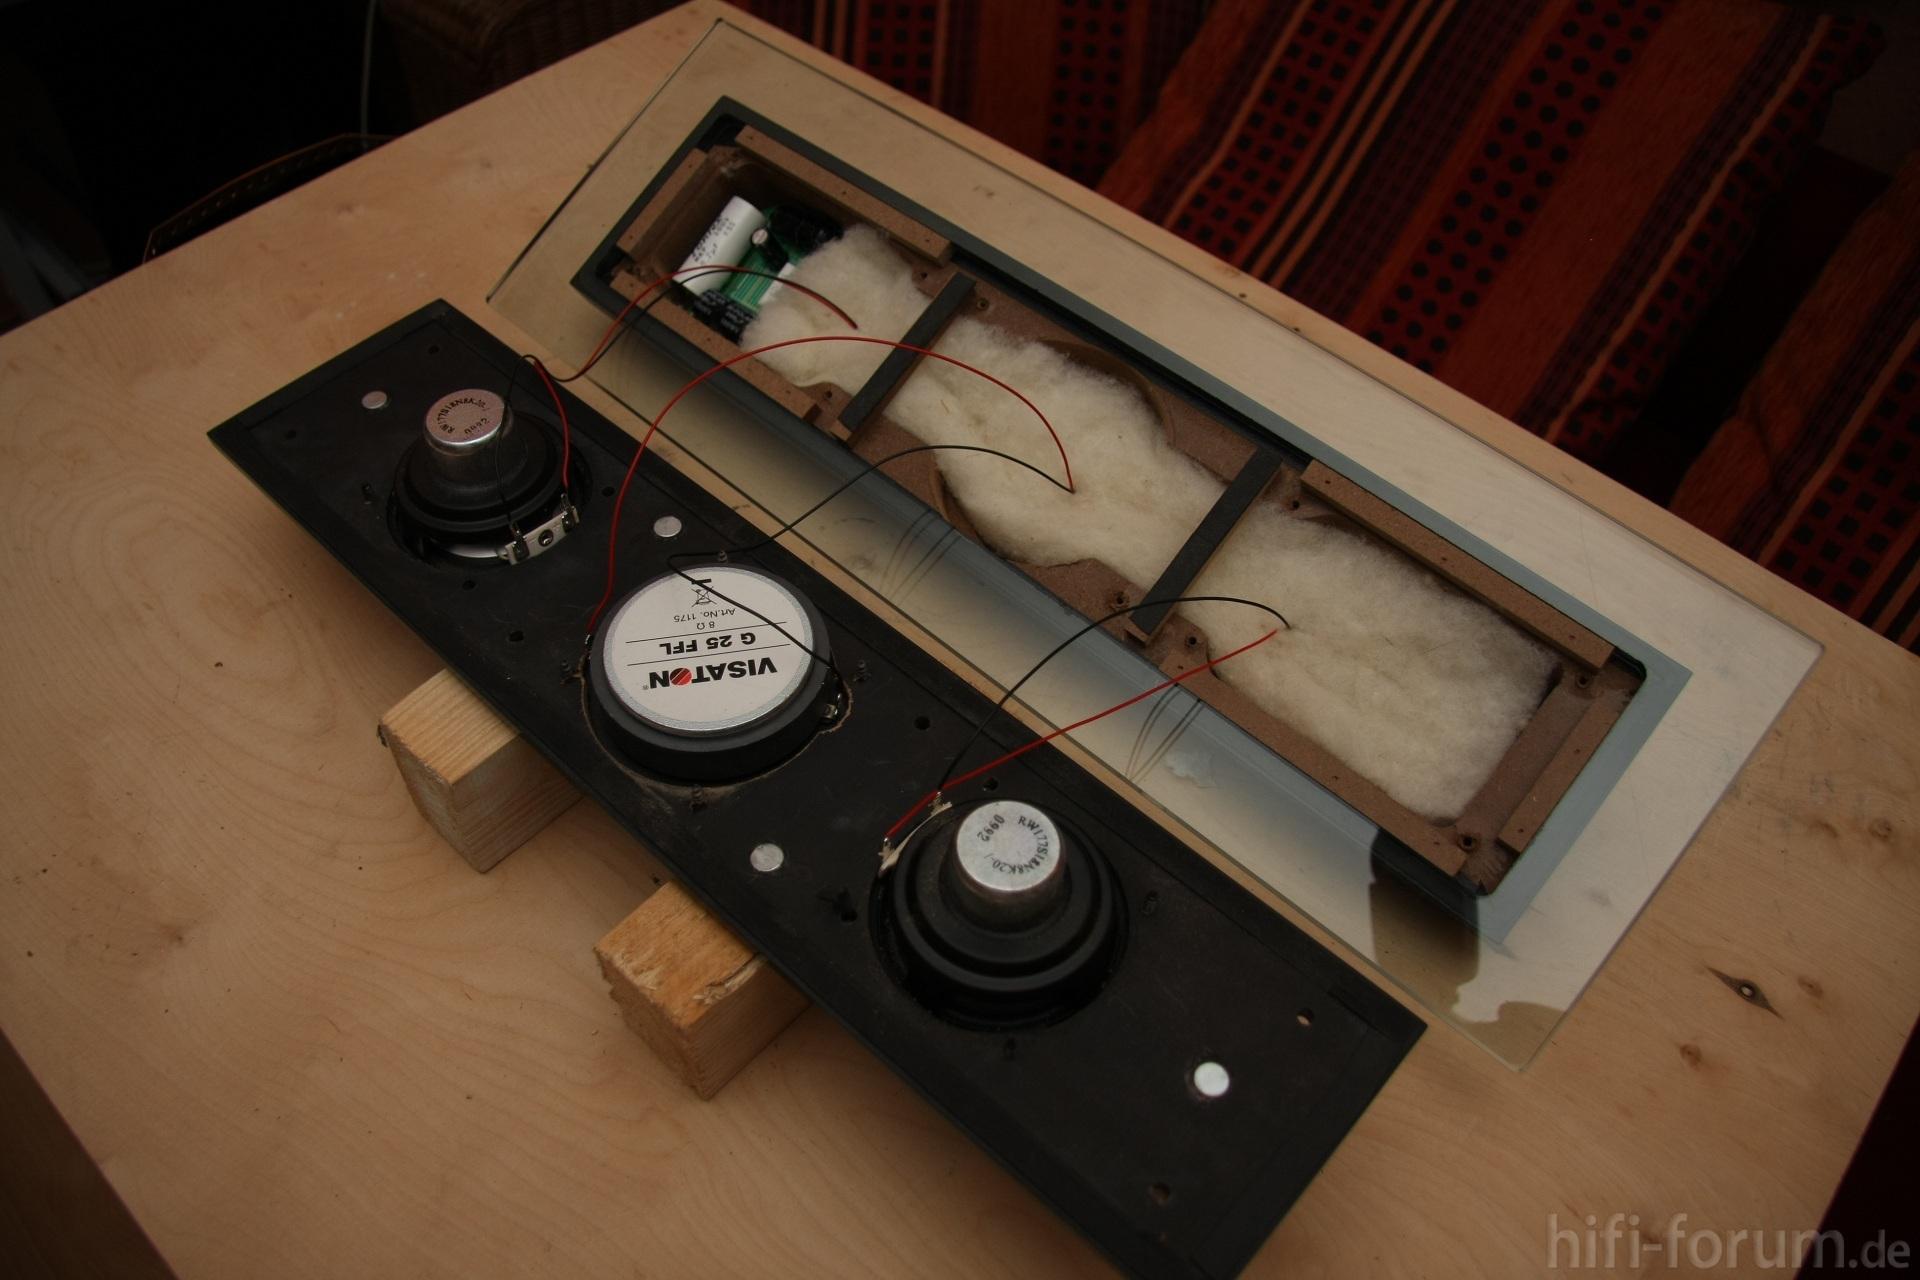 umbau teufel motiv 6 anschluss der chassis doityourself ffl g25 g25ffl motiv teufel. Black Bedroom Furniture Sets. Home Design Ideas